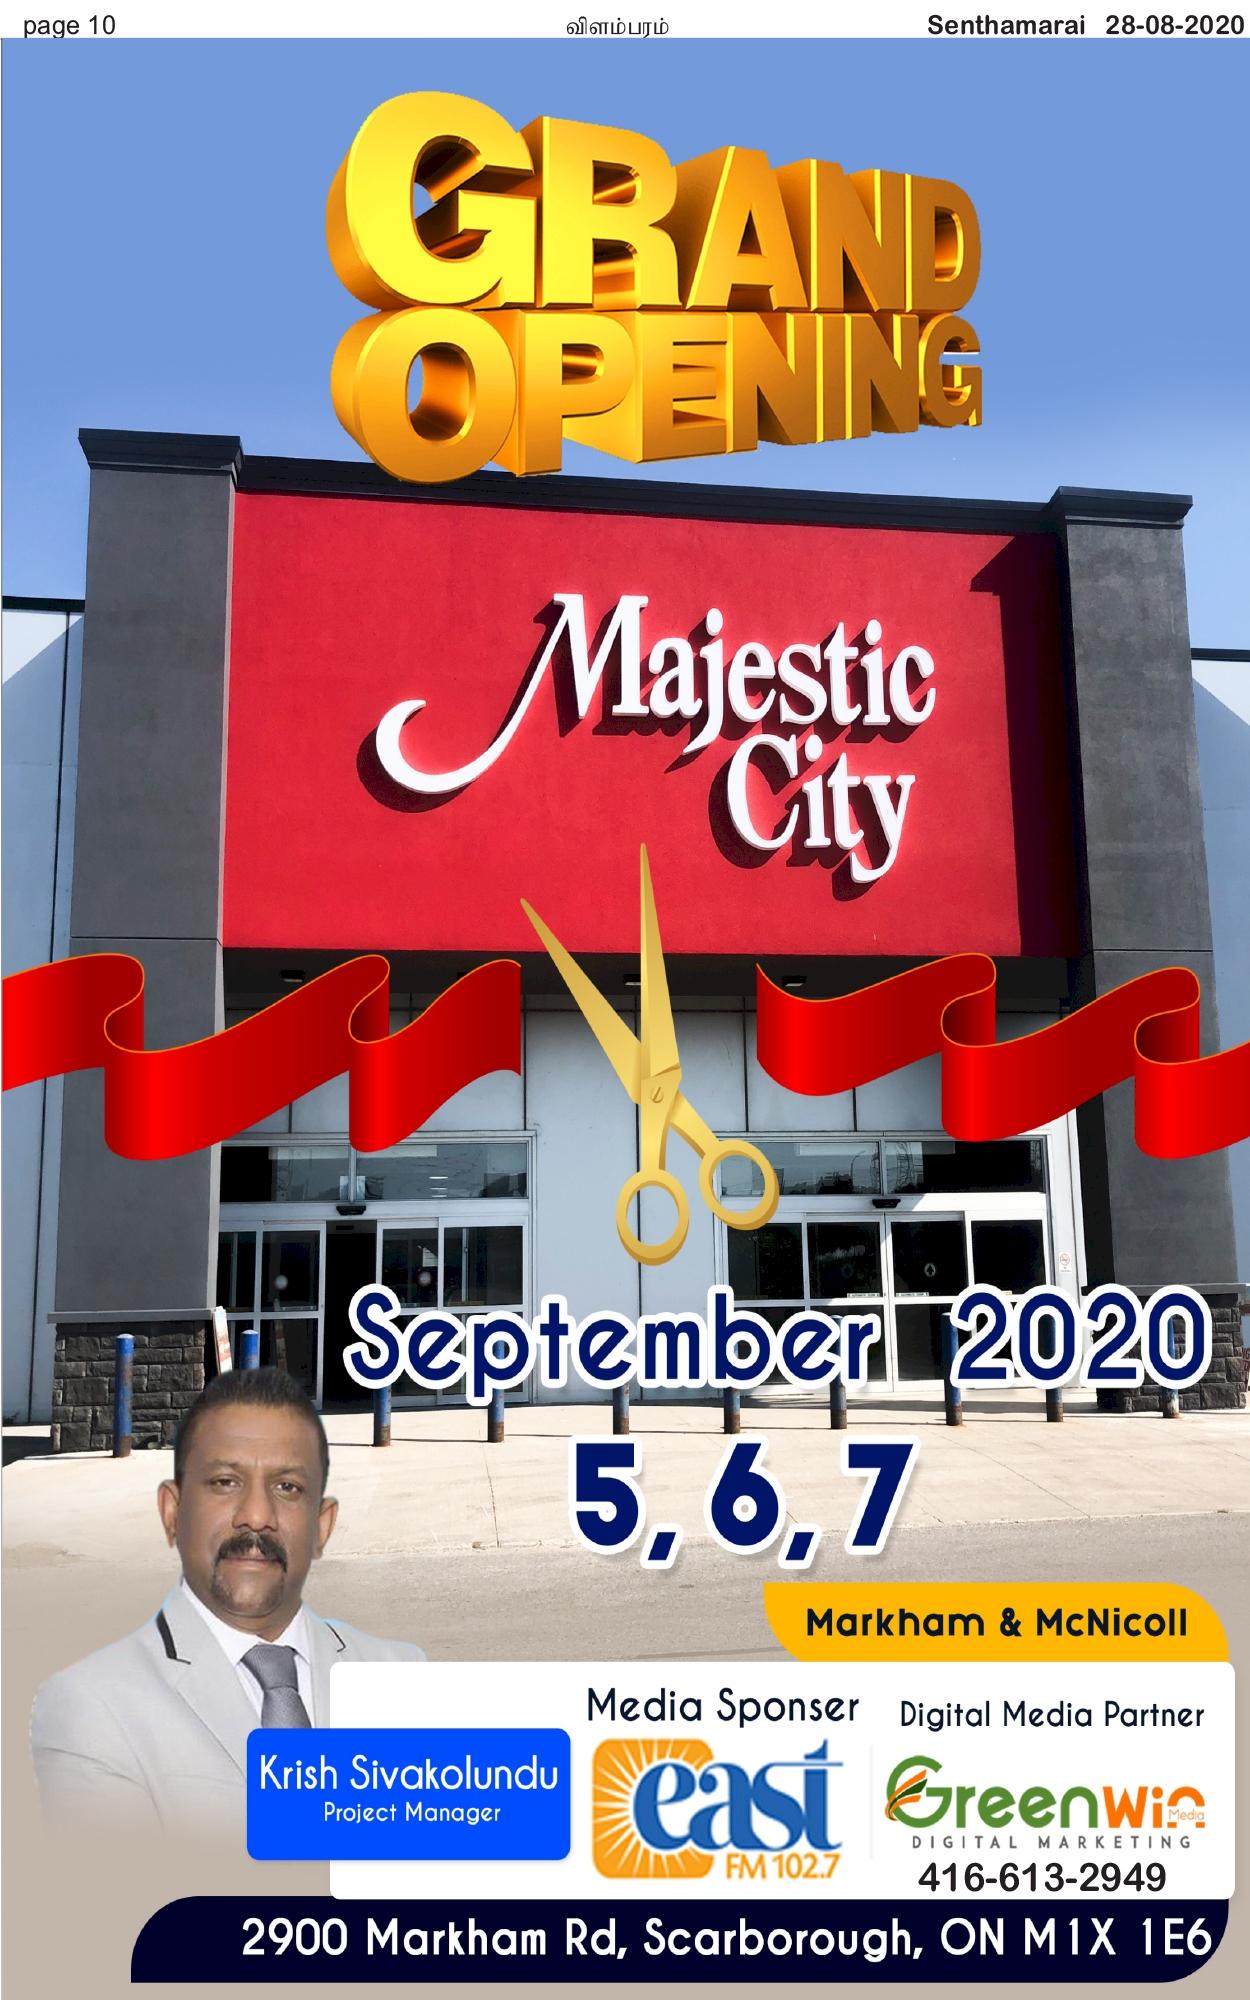 2020-08-28